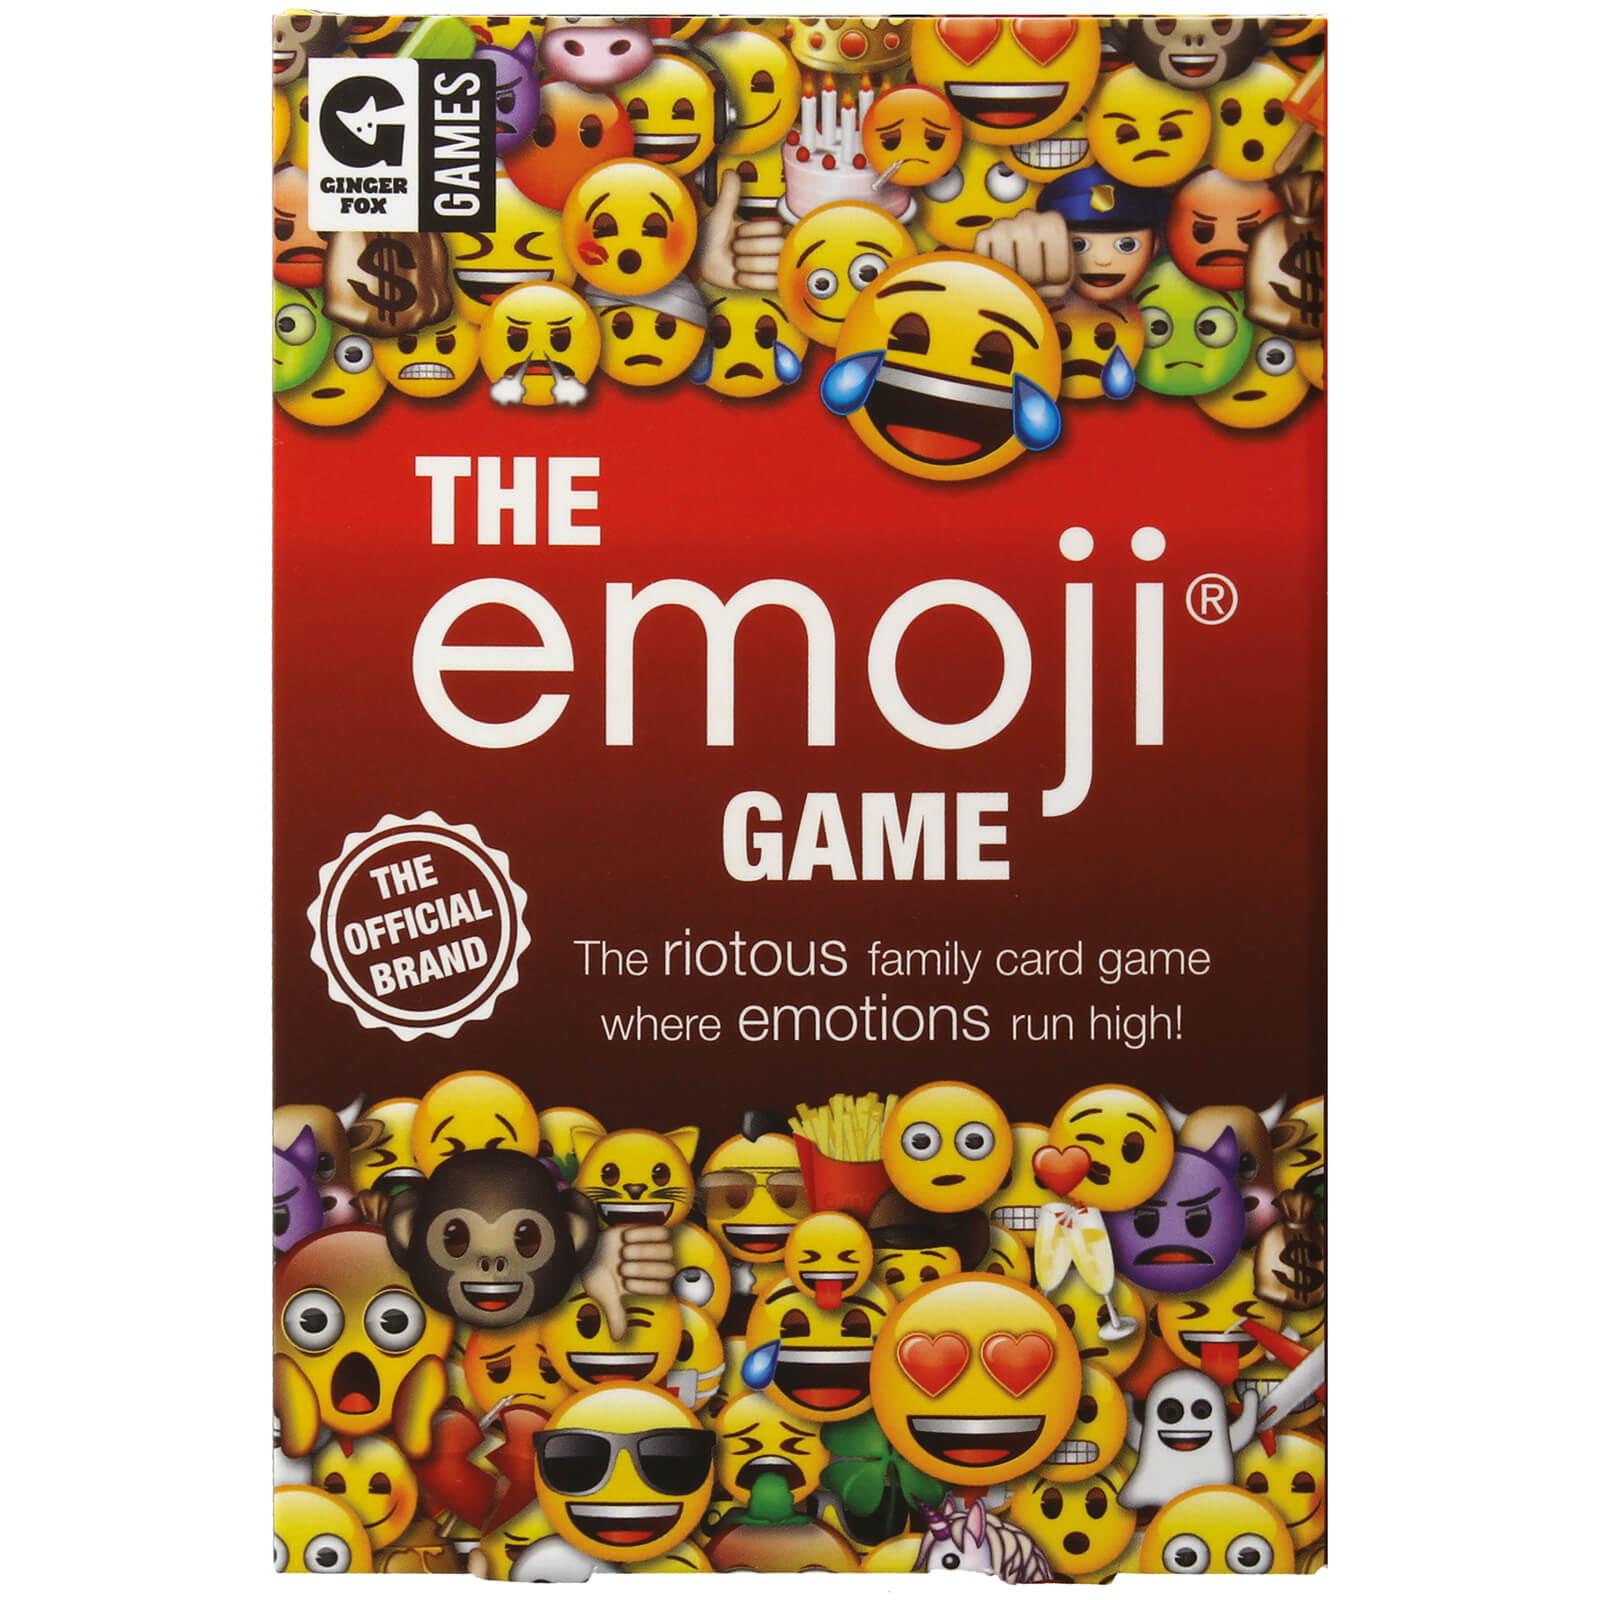 Image of The Emoji Game